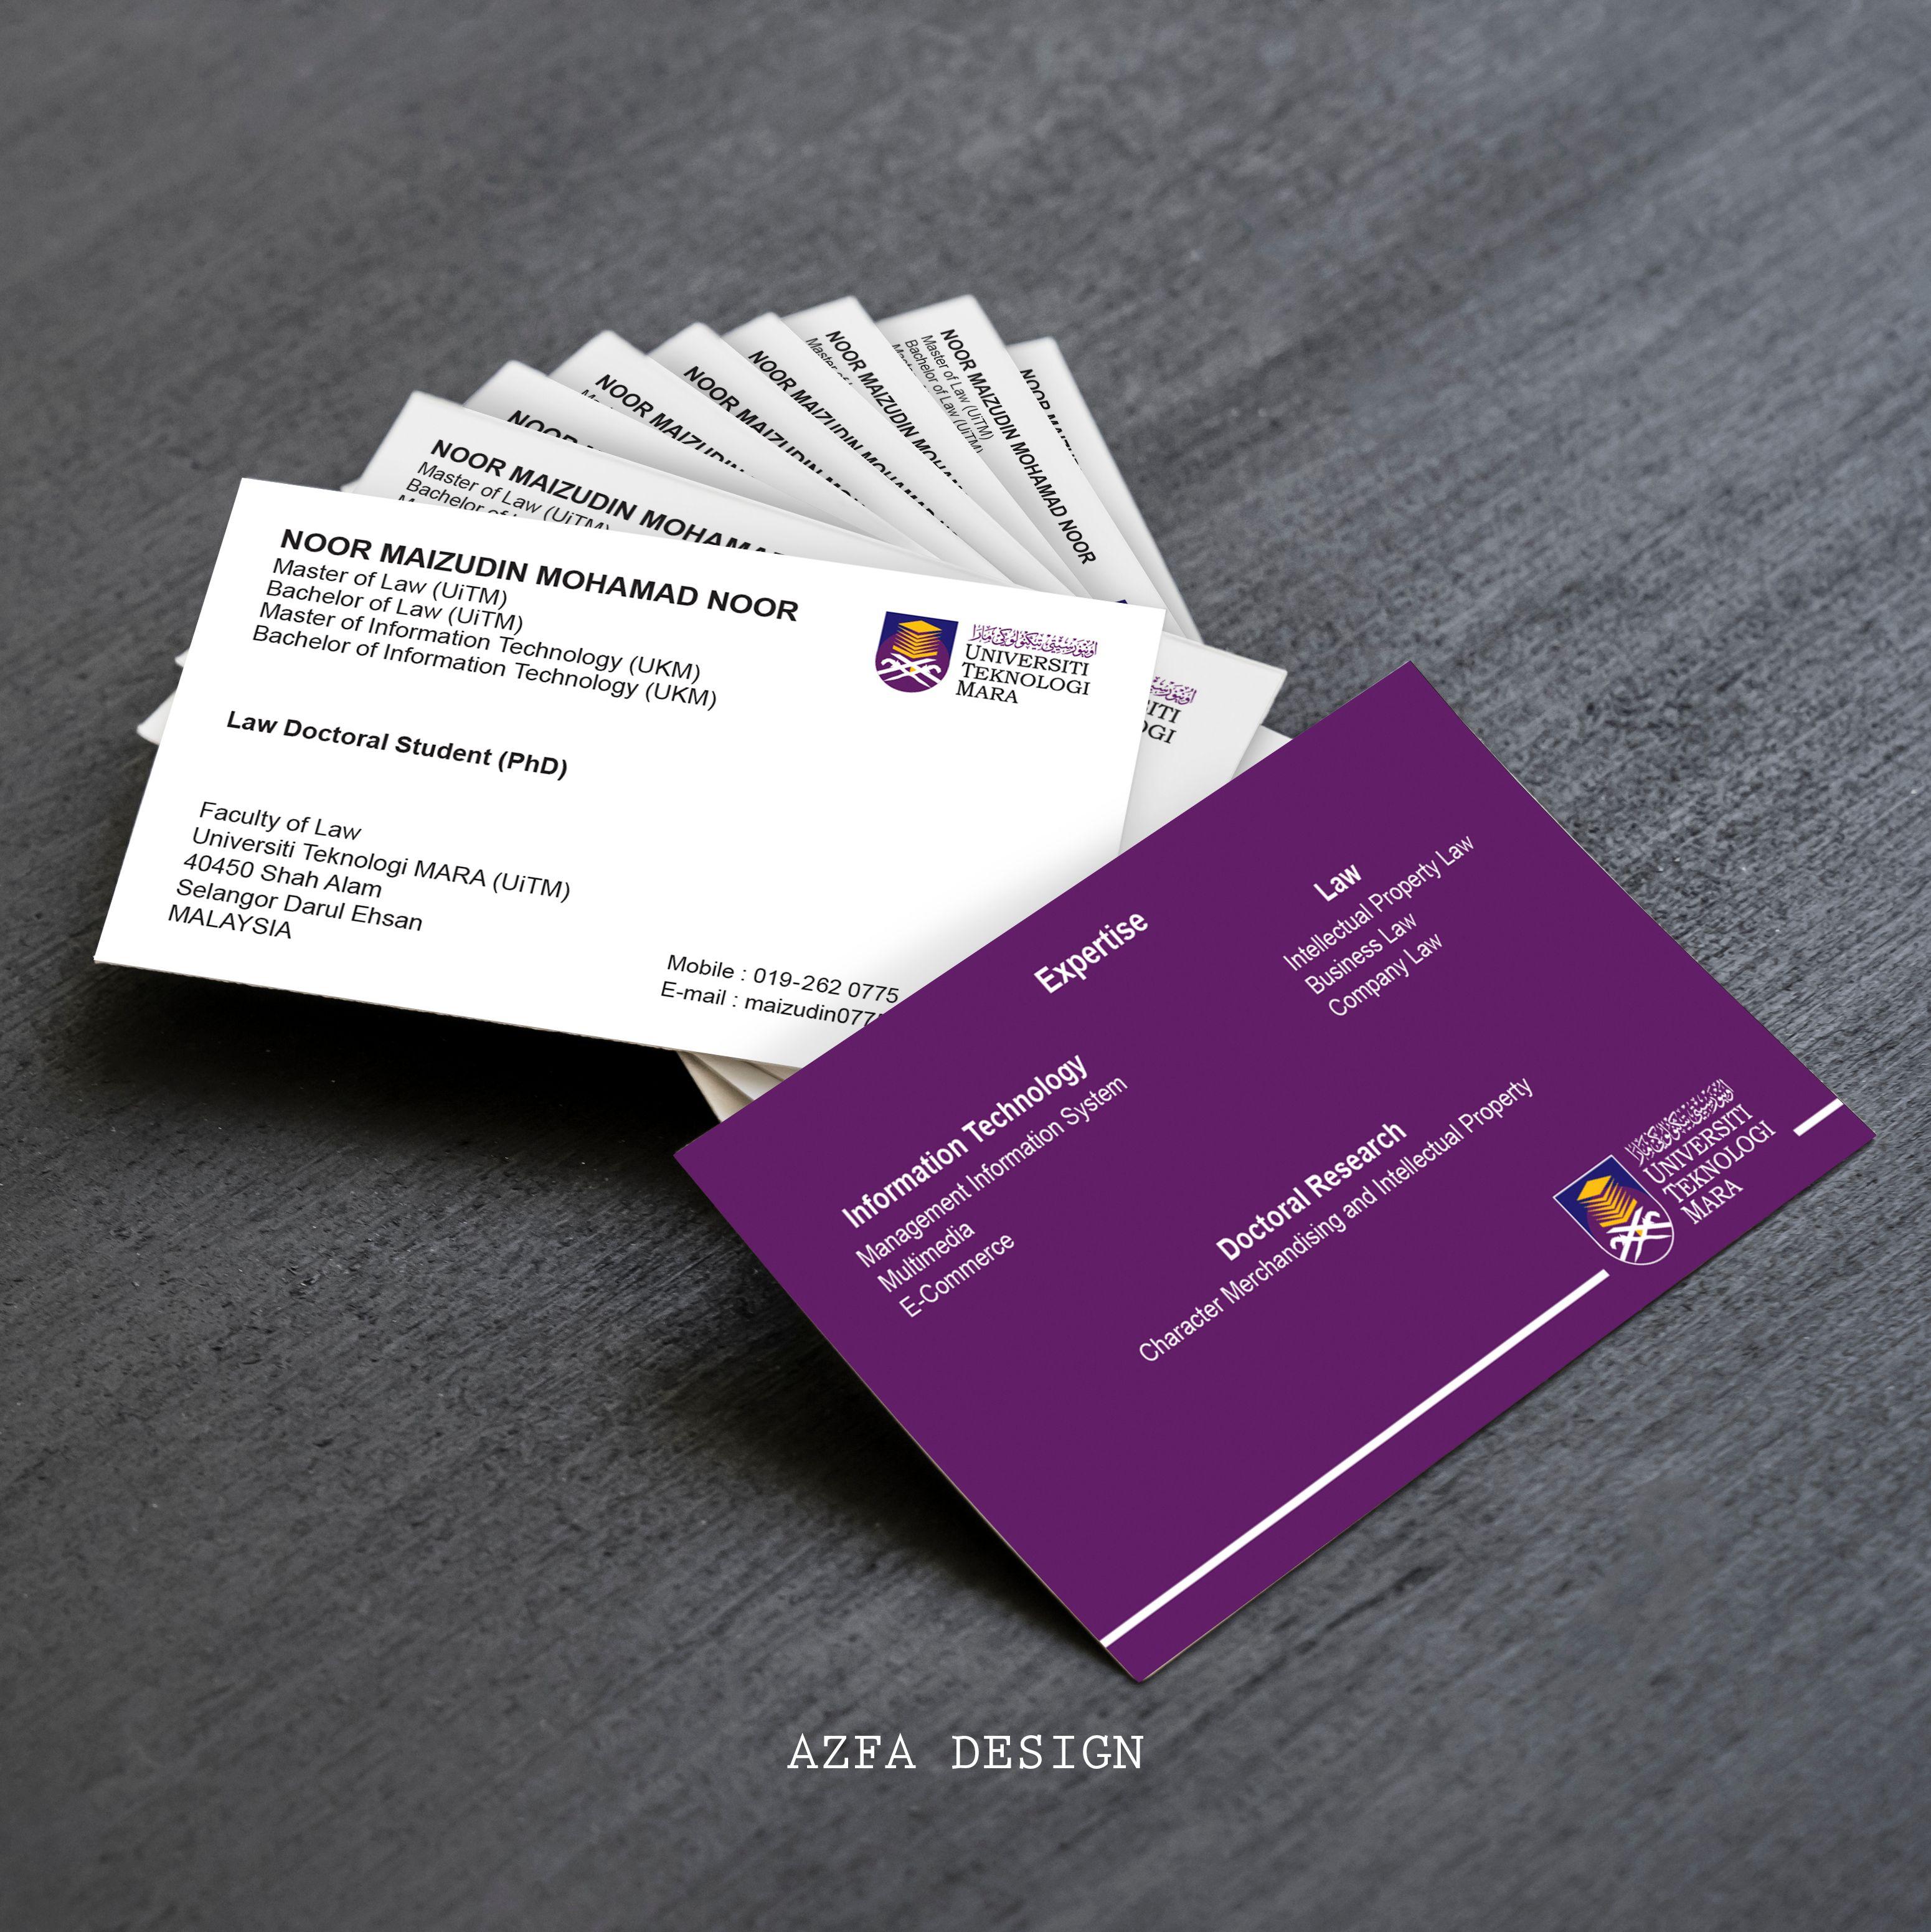 Azfadesign Bisneskaddesign Anda Merupakan Orang Penting Dalam Syarikat Seperti Ceo Director Project Manager Atau Business Law Information Technology Cards